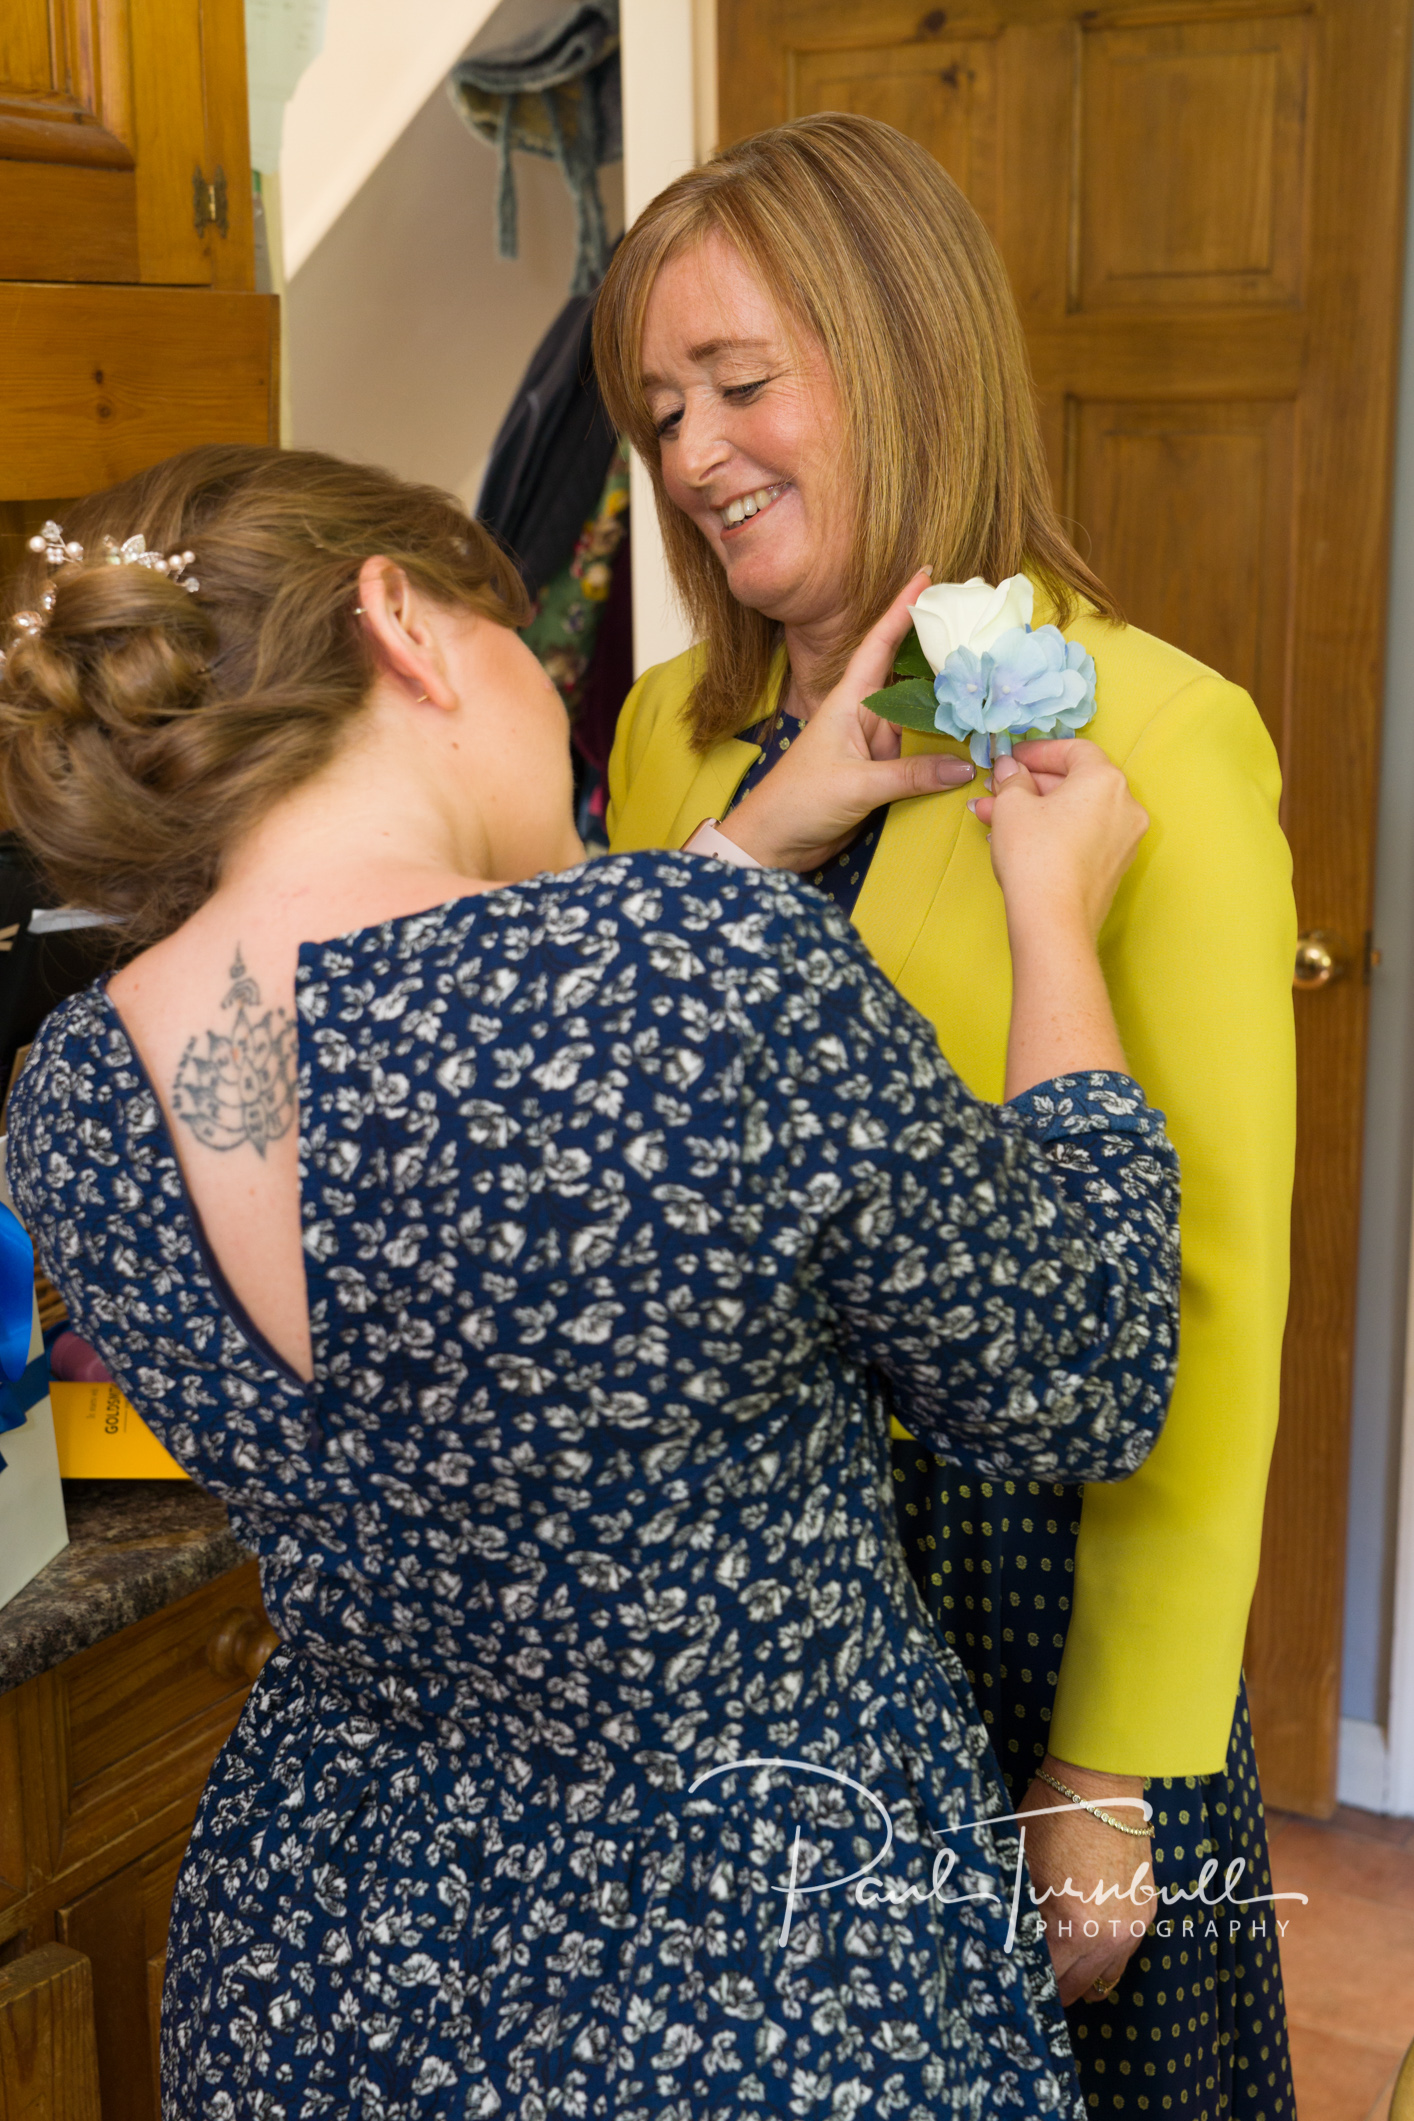 wedding-photographer-south-dalton-walkington-yorkshire-emma-james-021.jpg